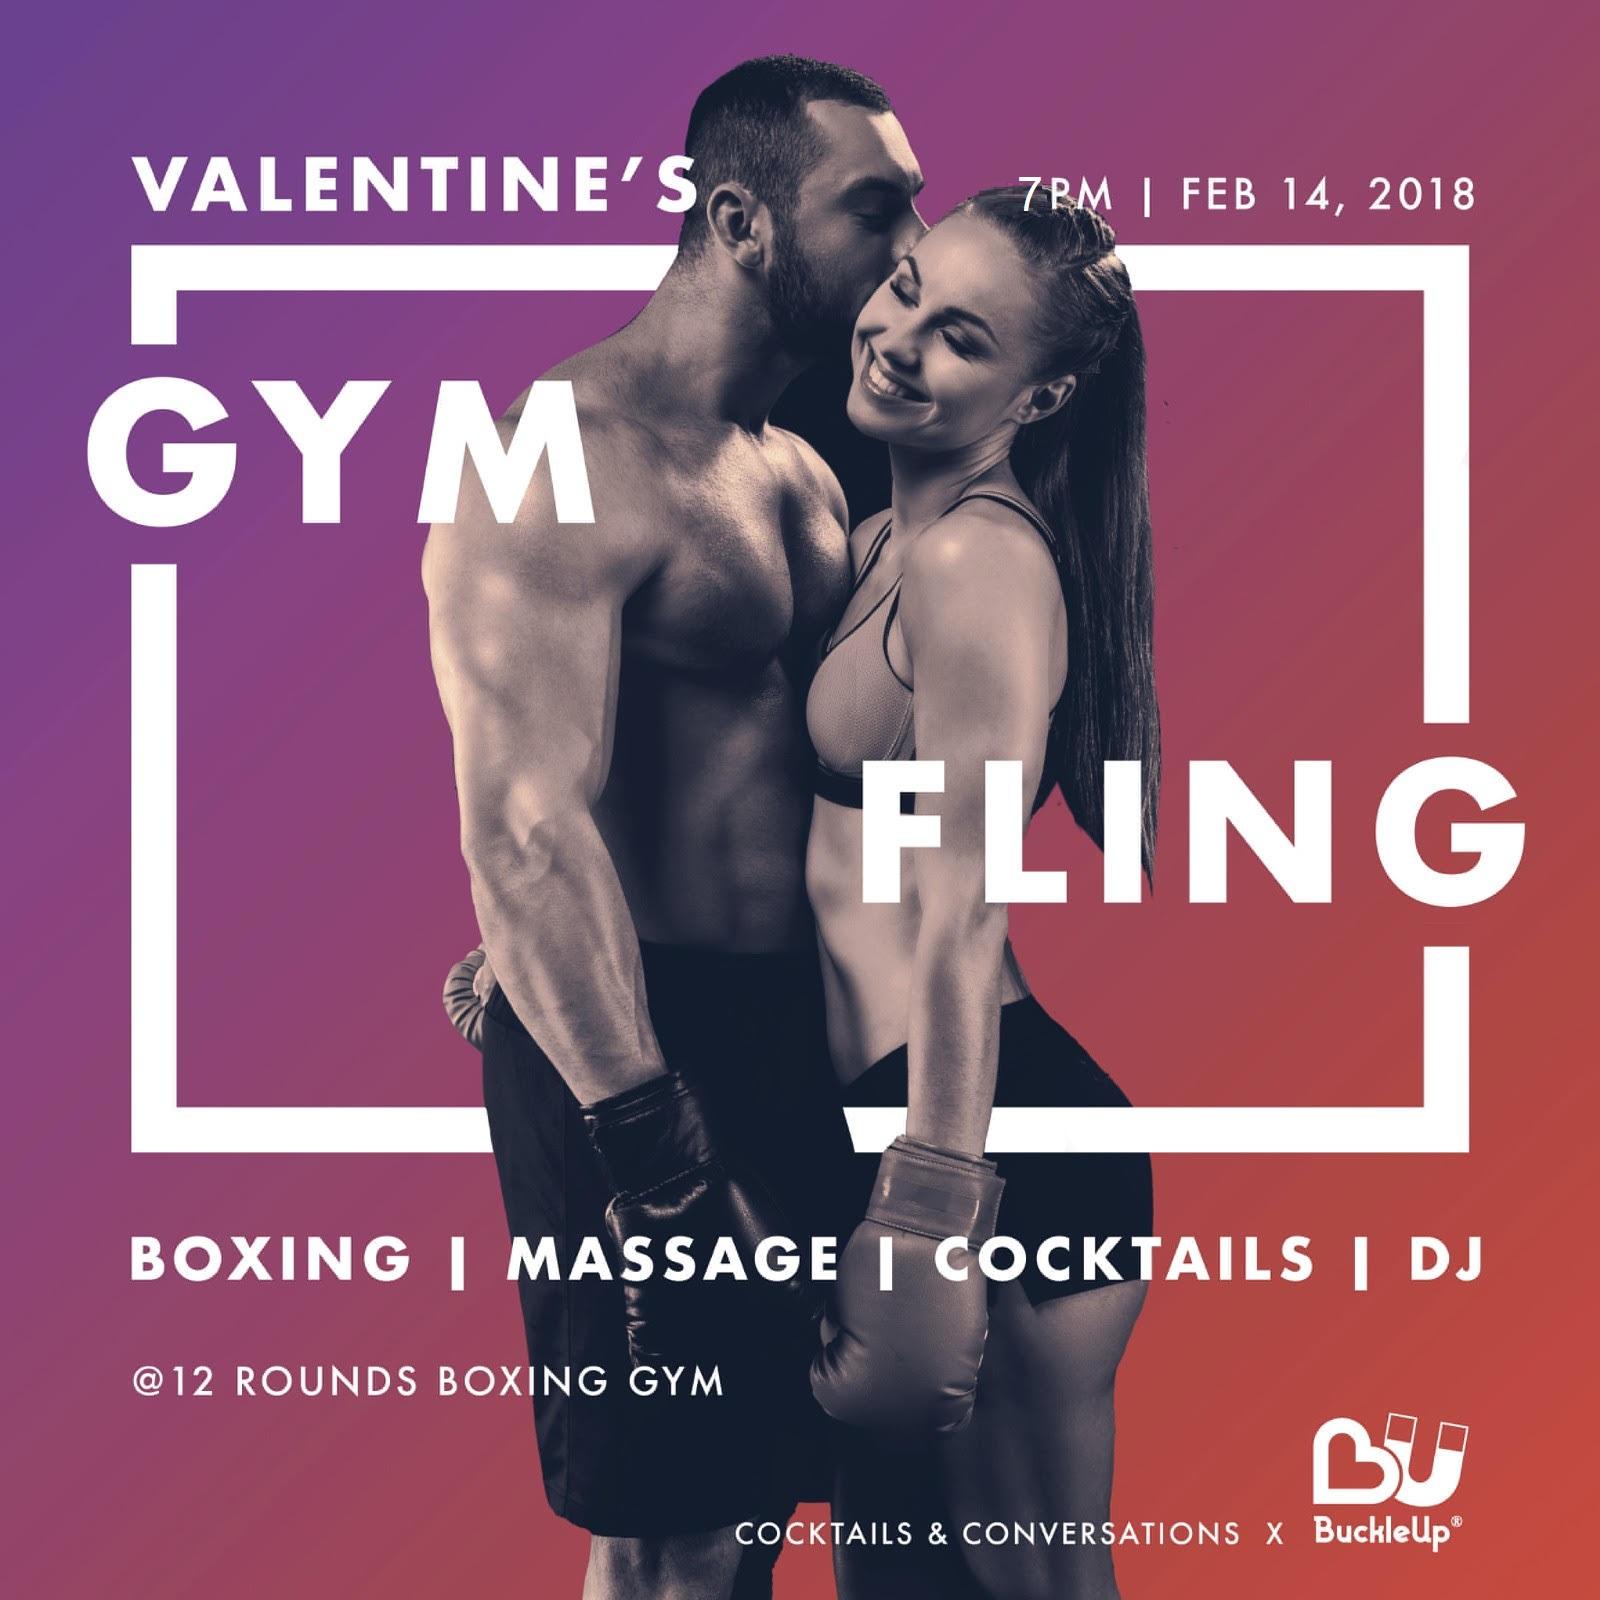 Gym Fling Poster